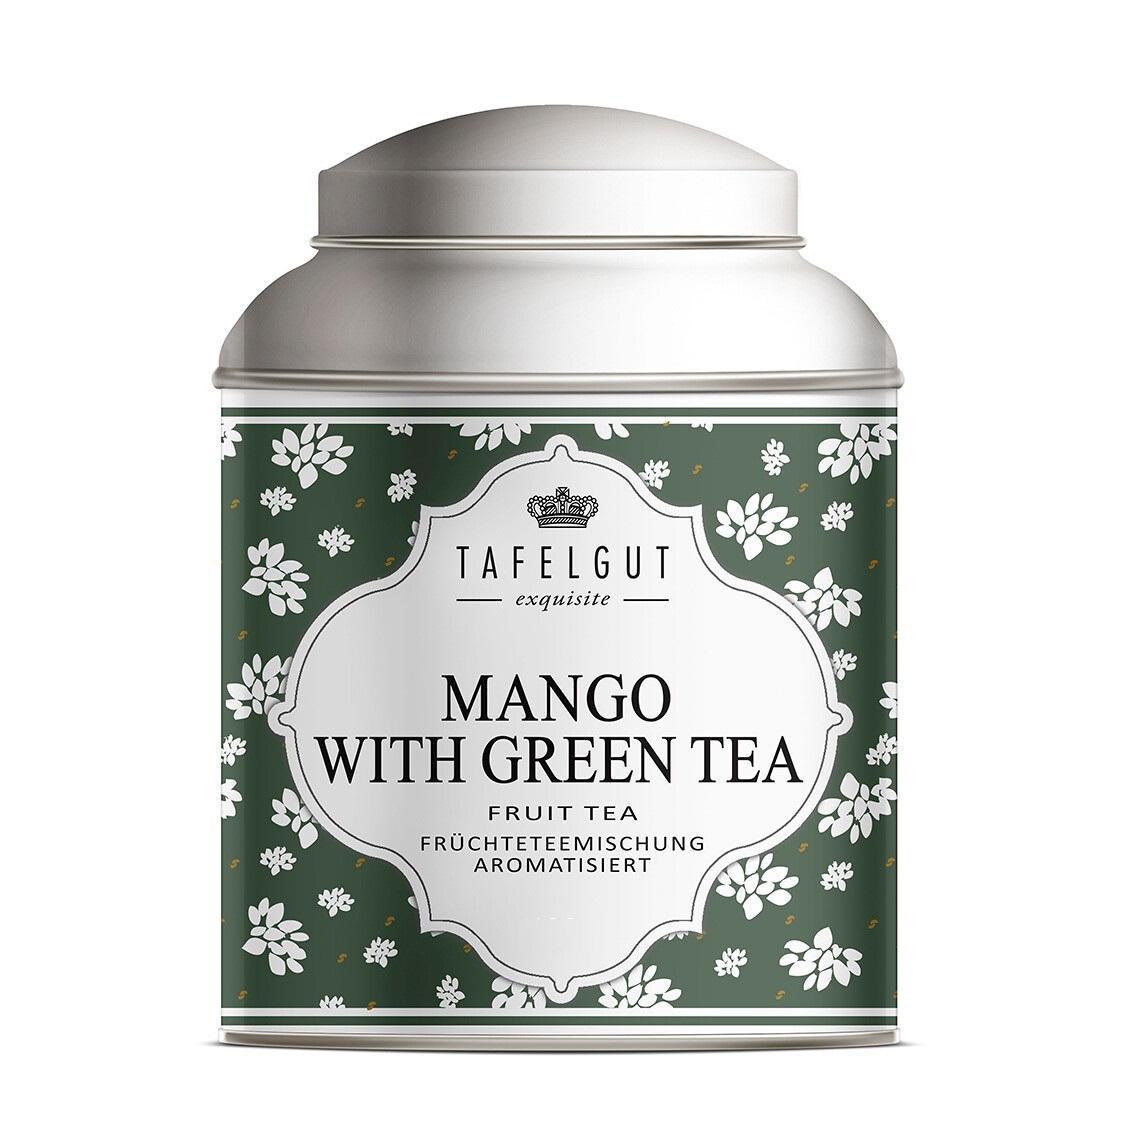 TAFELGUT Ovocný čaj Mango Green Tea - 30g, zelená barva, kov